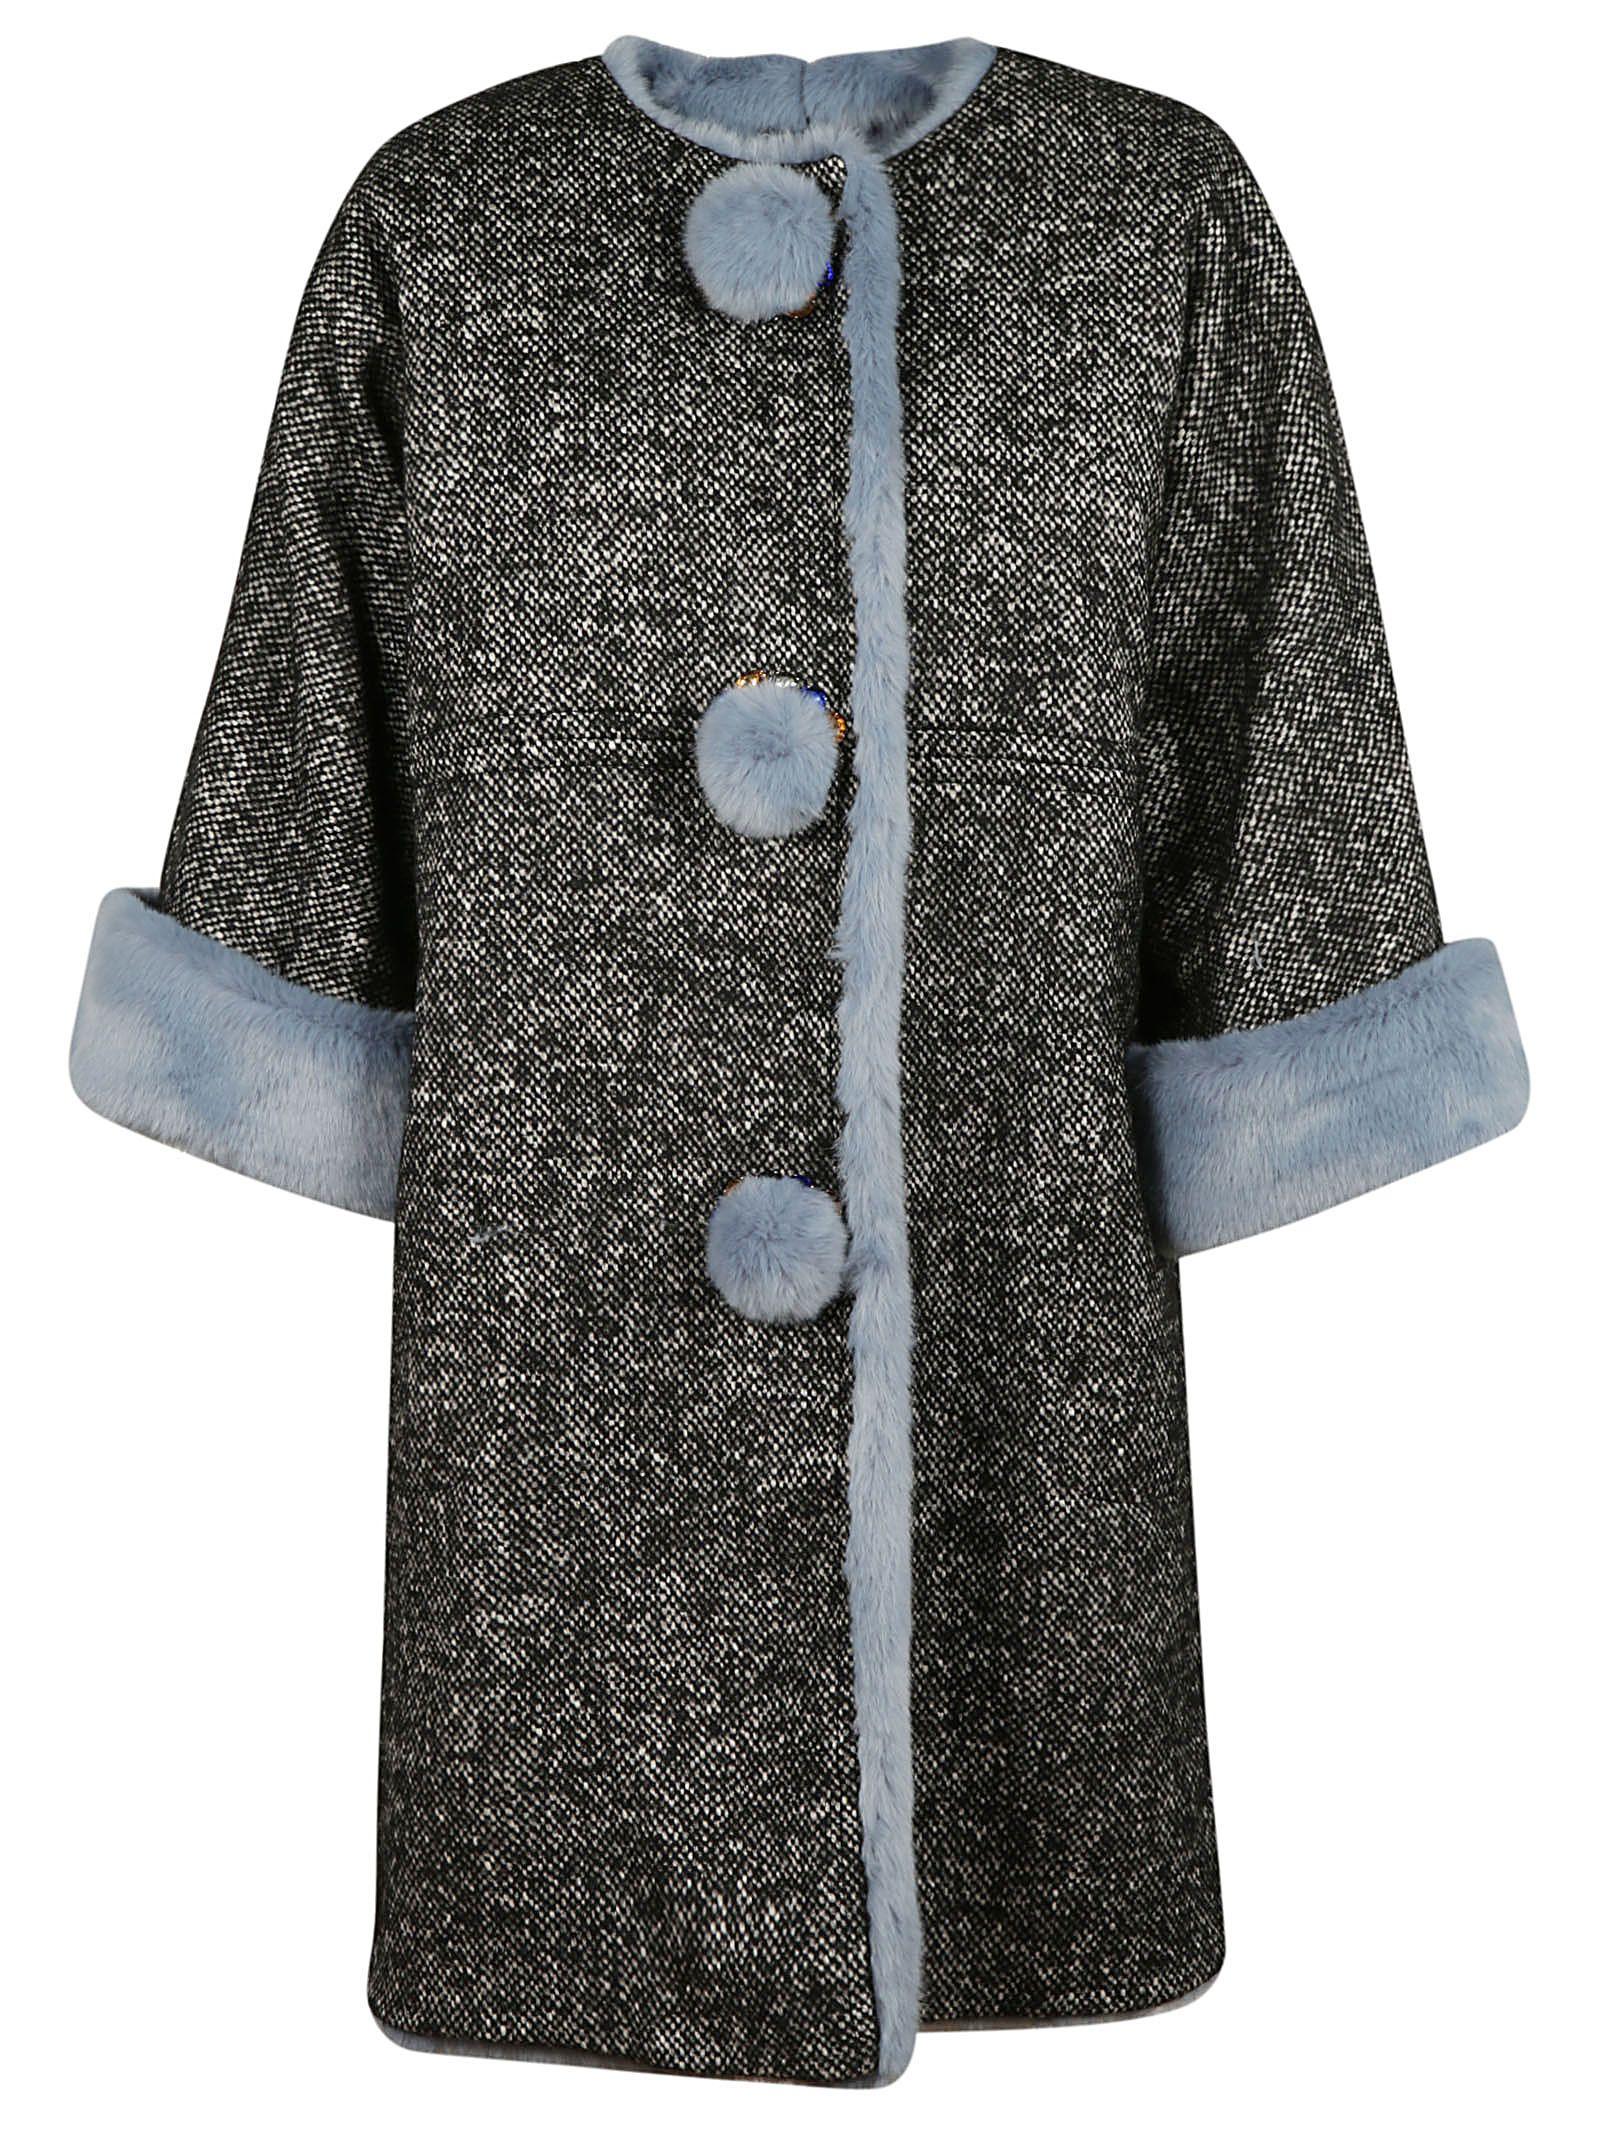 Dolce Gabbana Fur Trim Oversized Coat in Multicolored